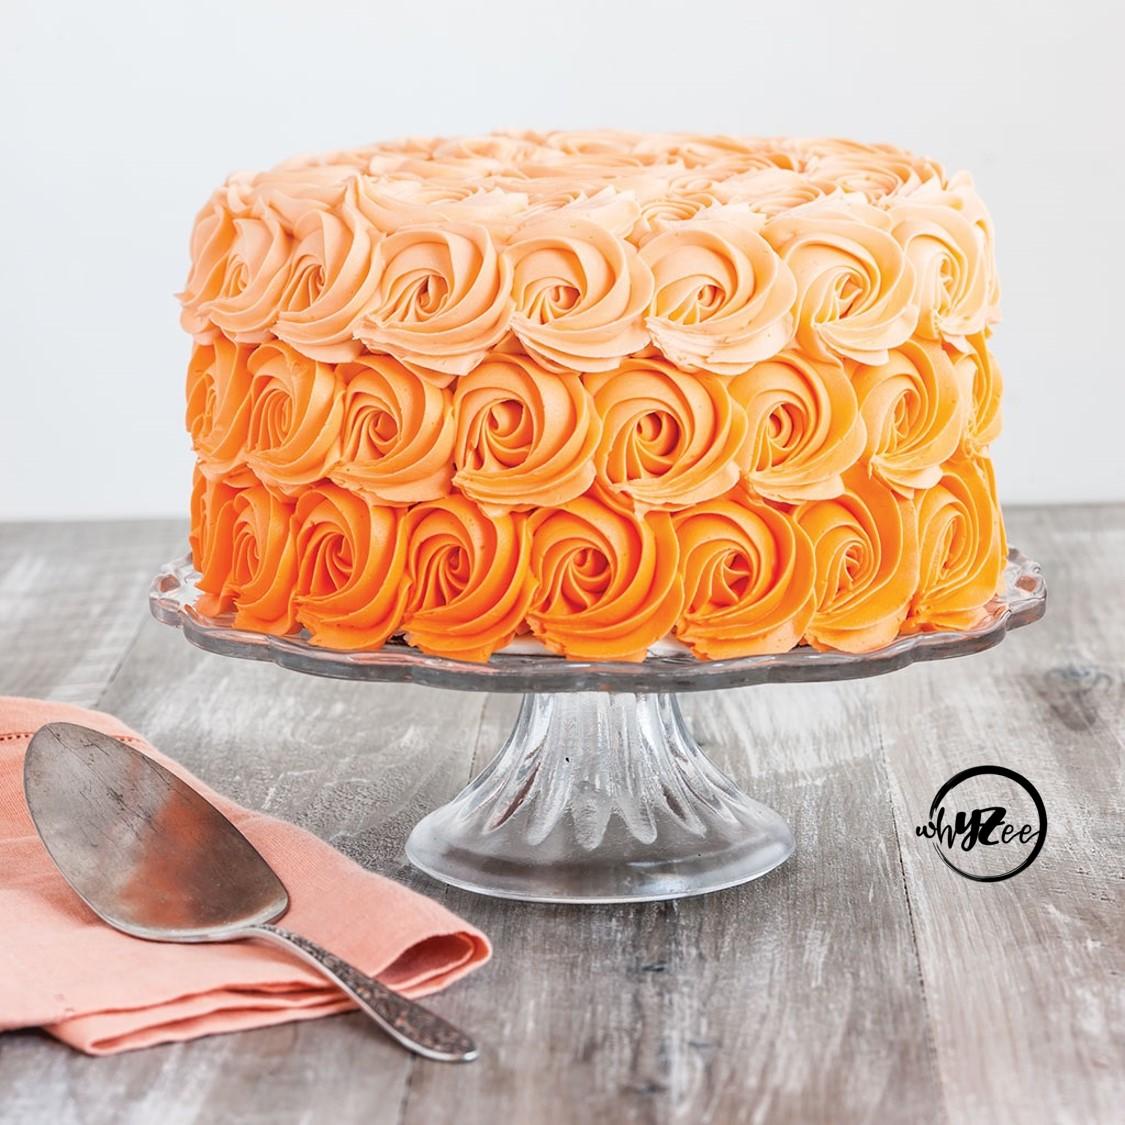 Peachy Ombre Rosette Cake Whyzee Birthday Cake Delivery Funny Birthday Cards Online Hetedamsfinfo